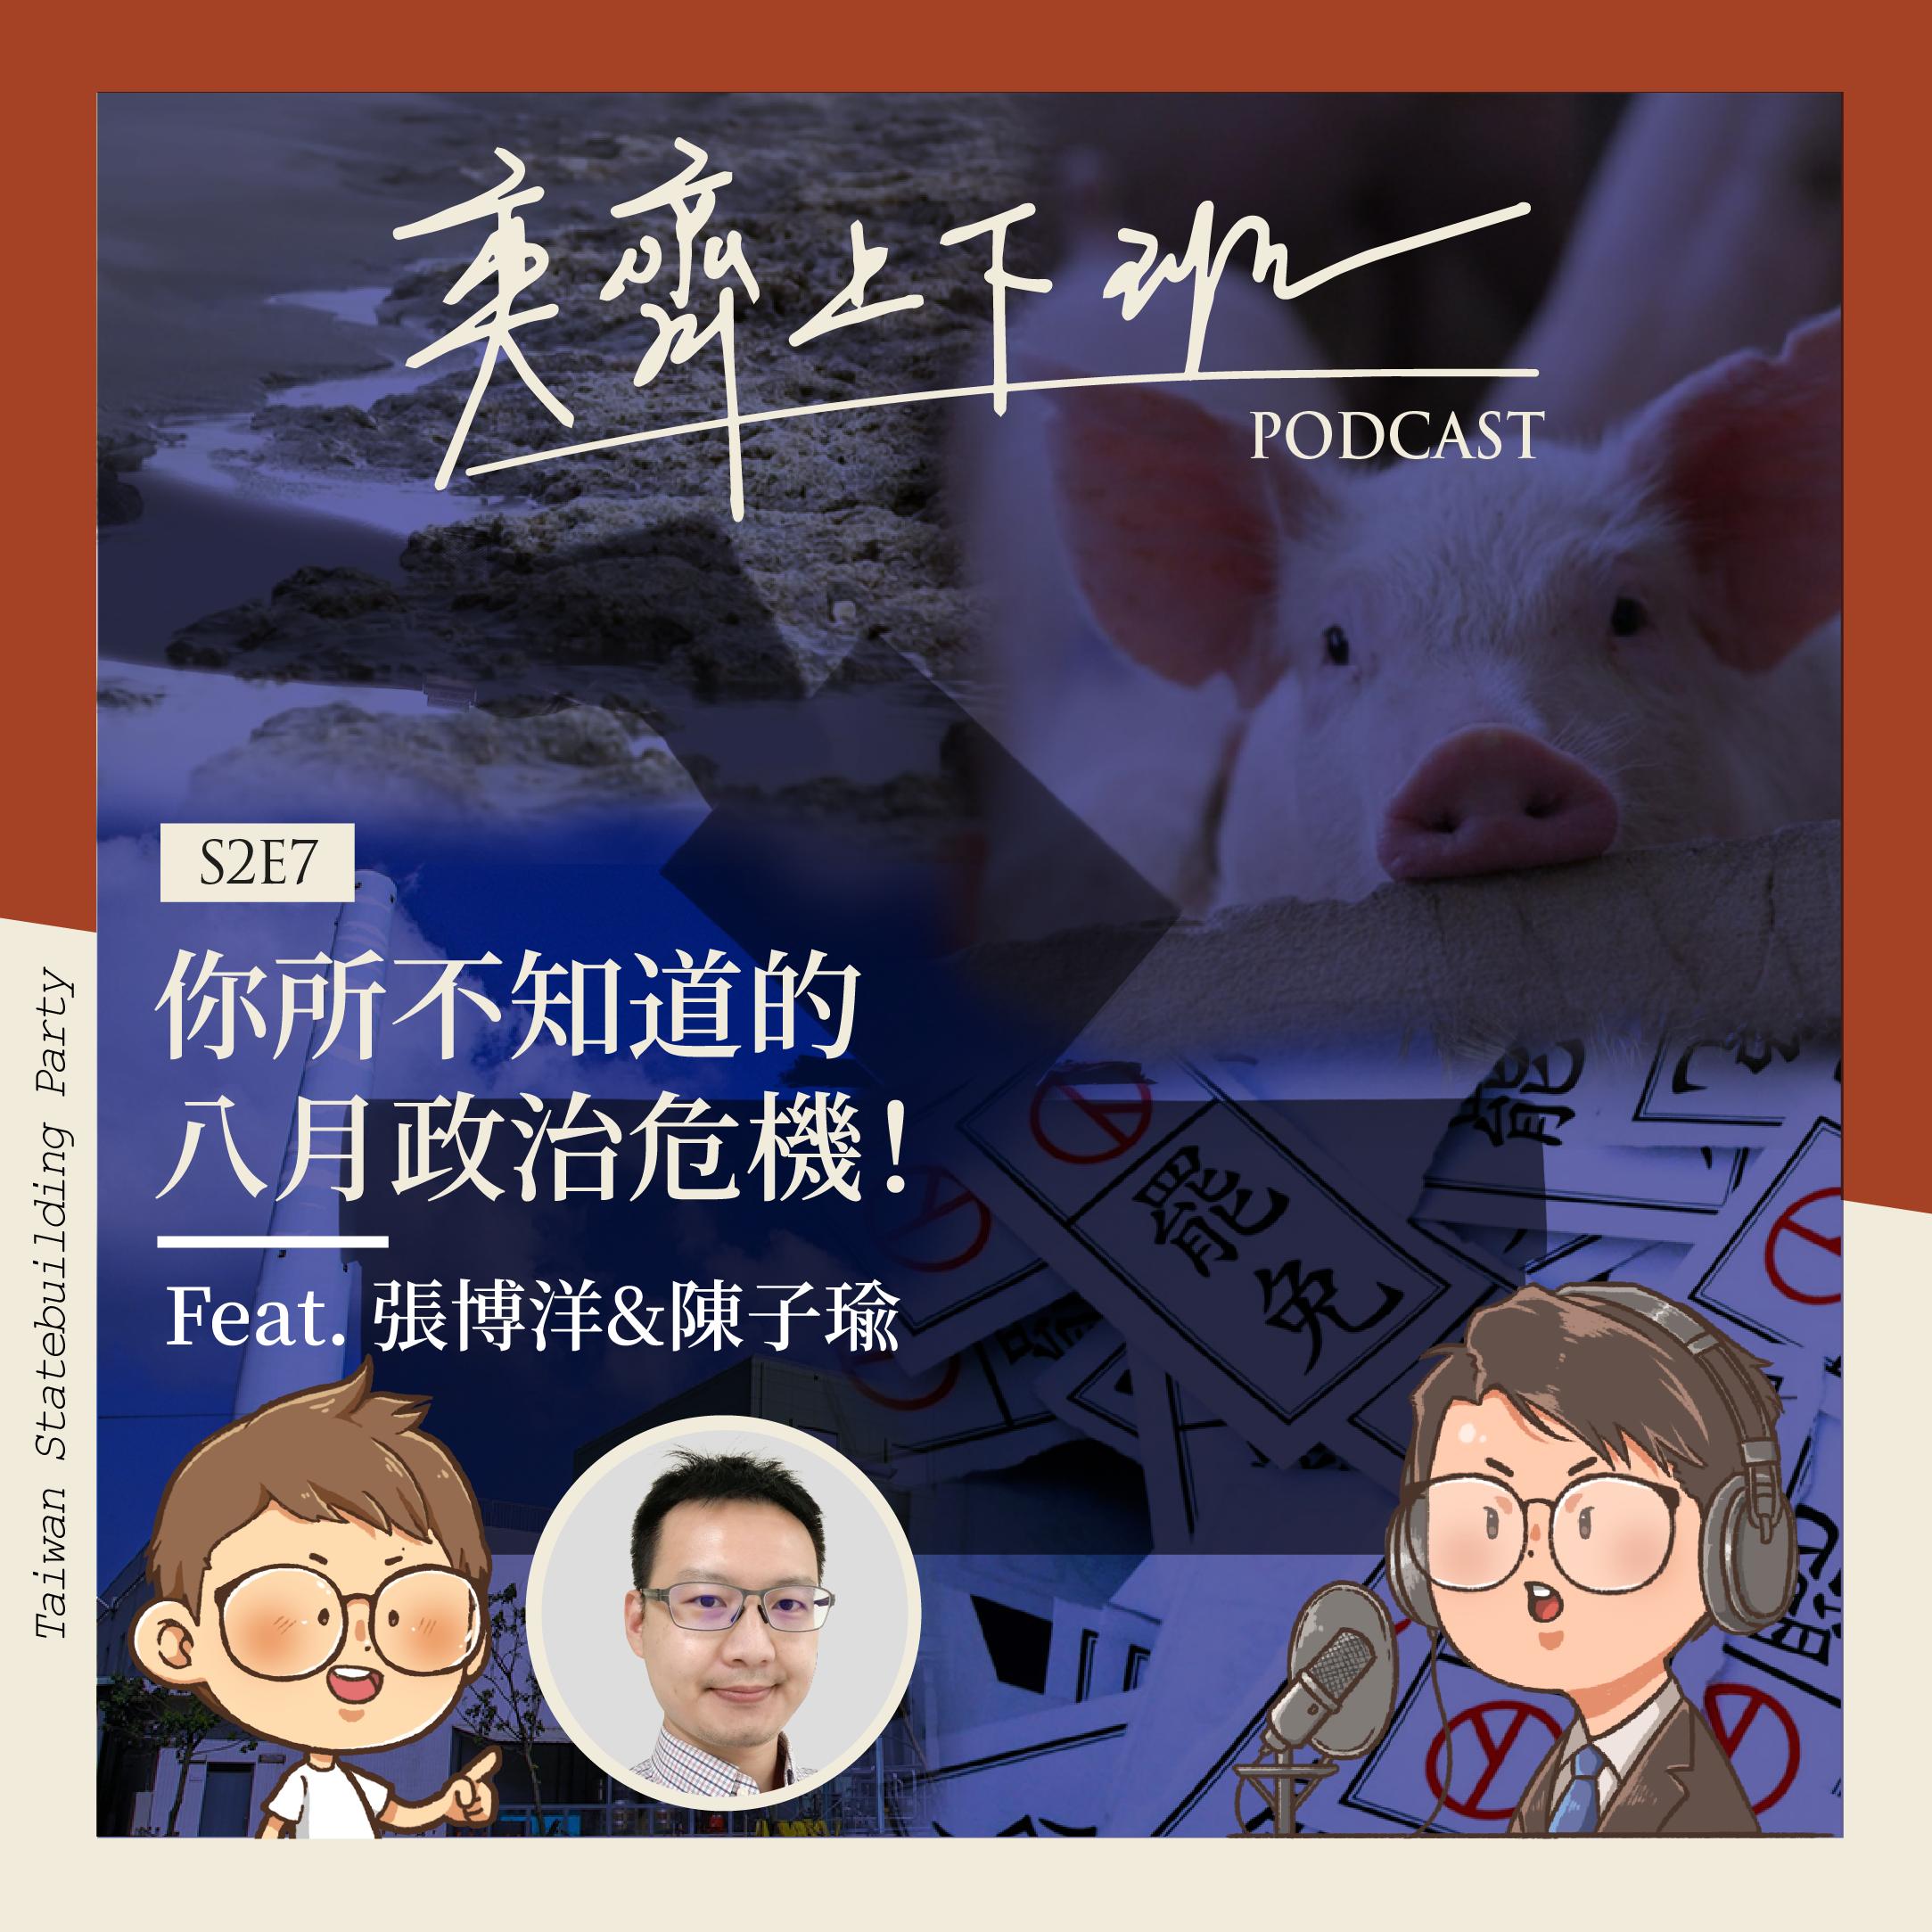 S2E7 你所不知道的八月政治危機!  Feat. 張博洋&陳子瑜